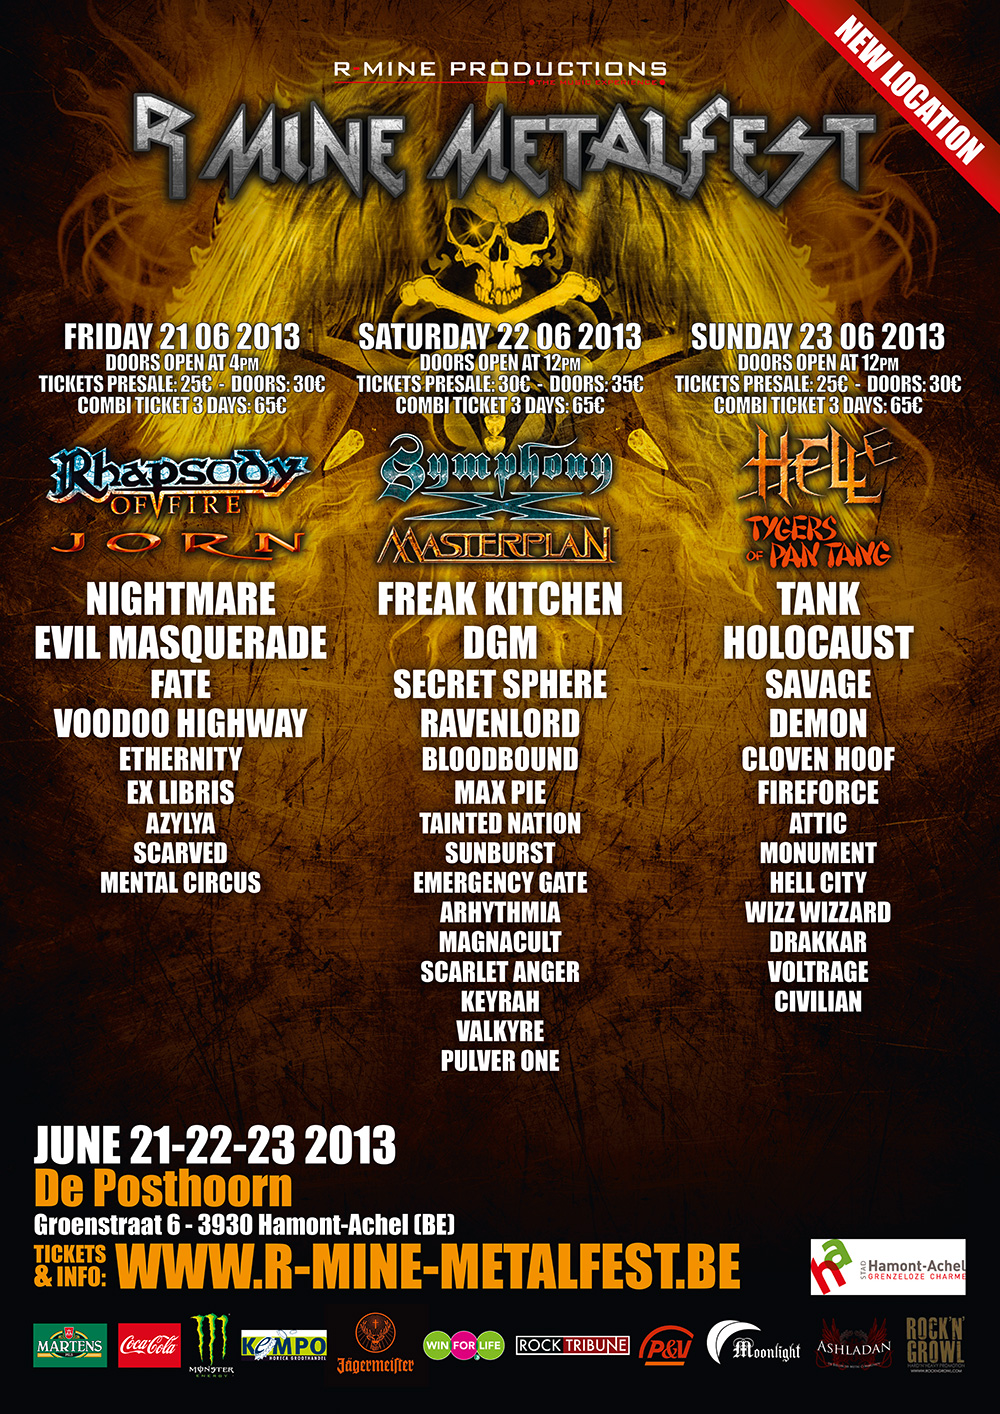 R-Mine Metalfest Lineup 2013